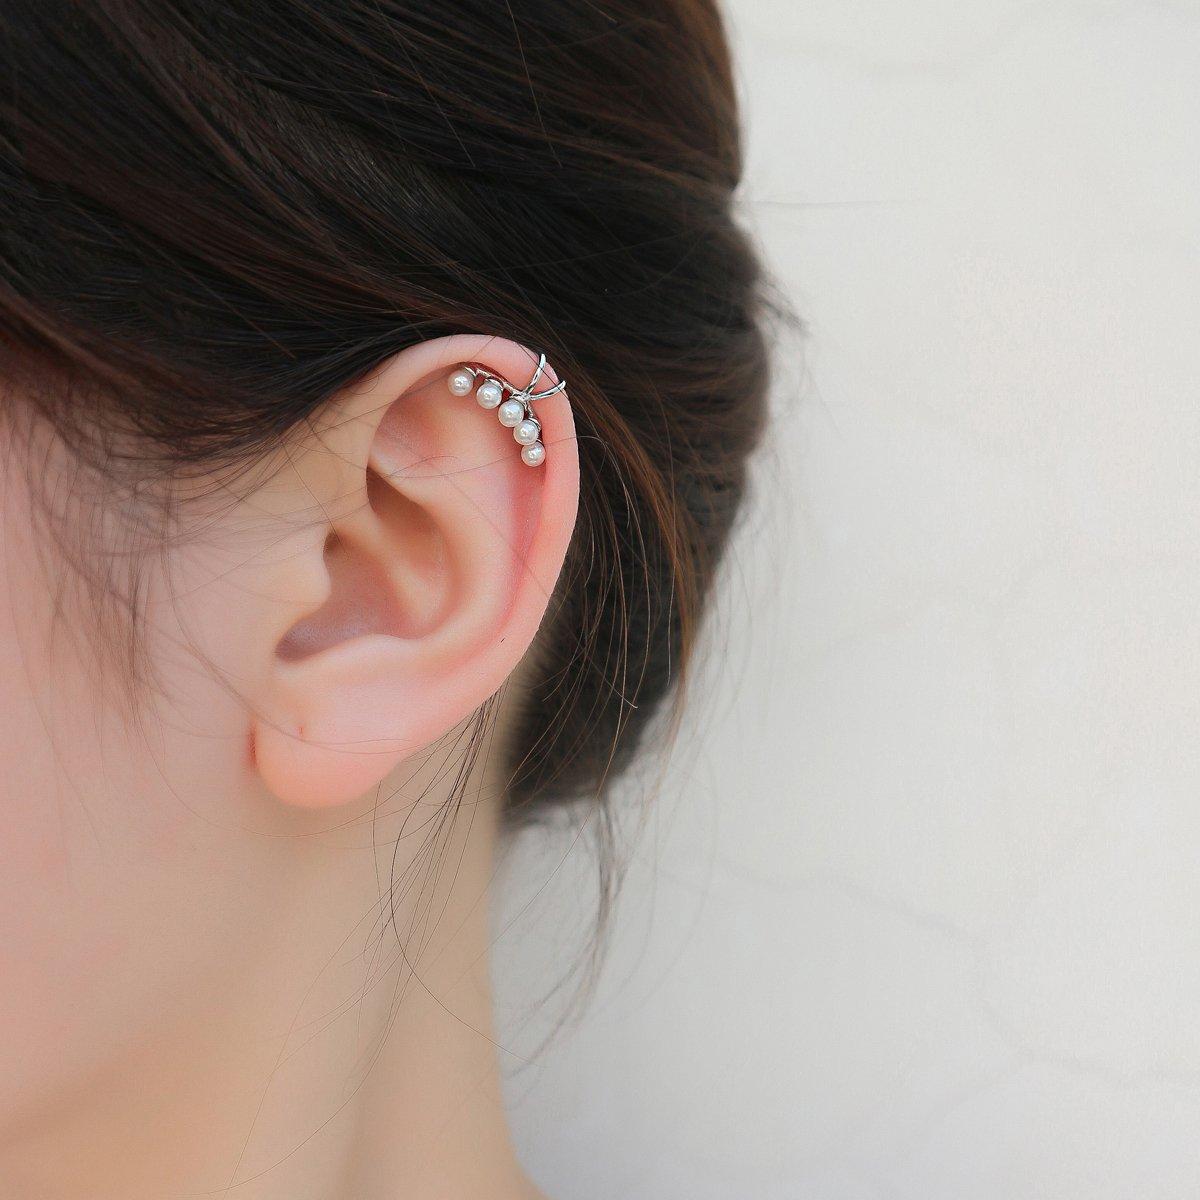 Aifeer Sterling Silver Non Pierced Ear Stud Earrings 5 Pearls Wrap Cuff Clip On Ear Clamp (A Pair) by Aifeer (Image #9)